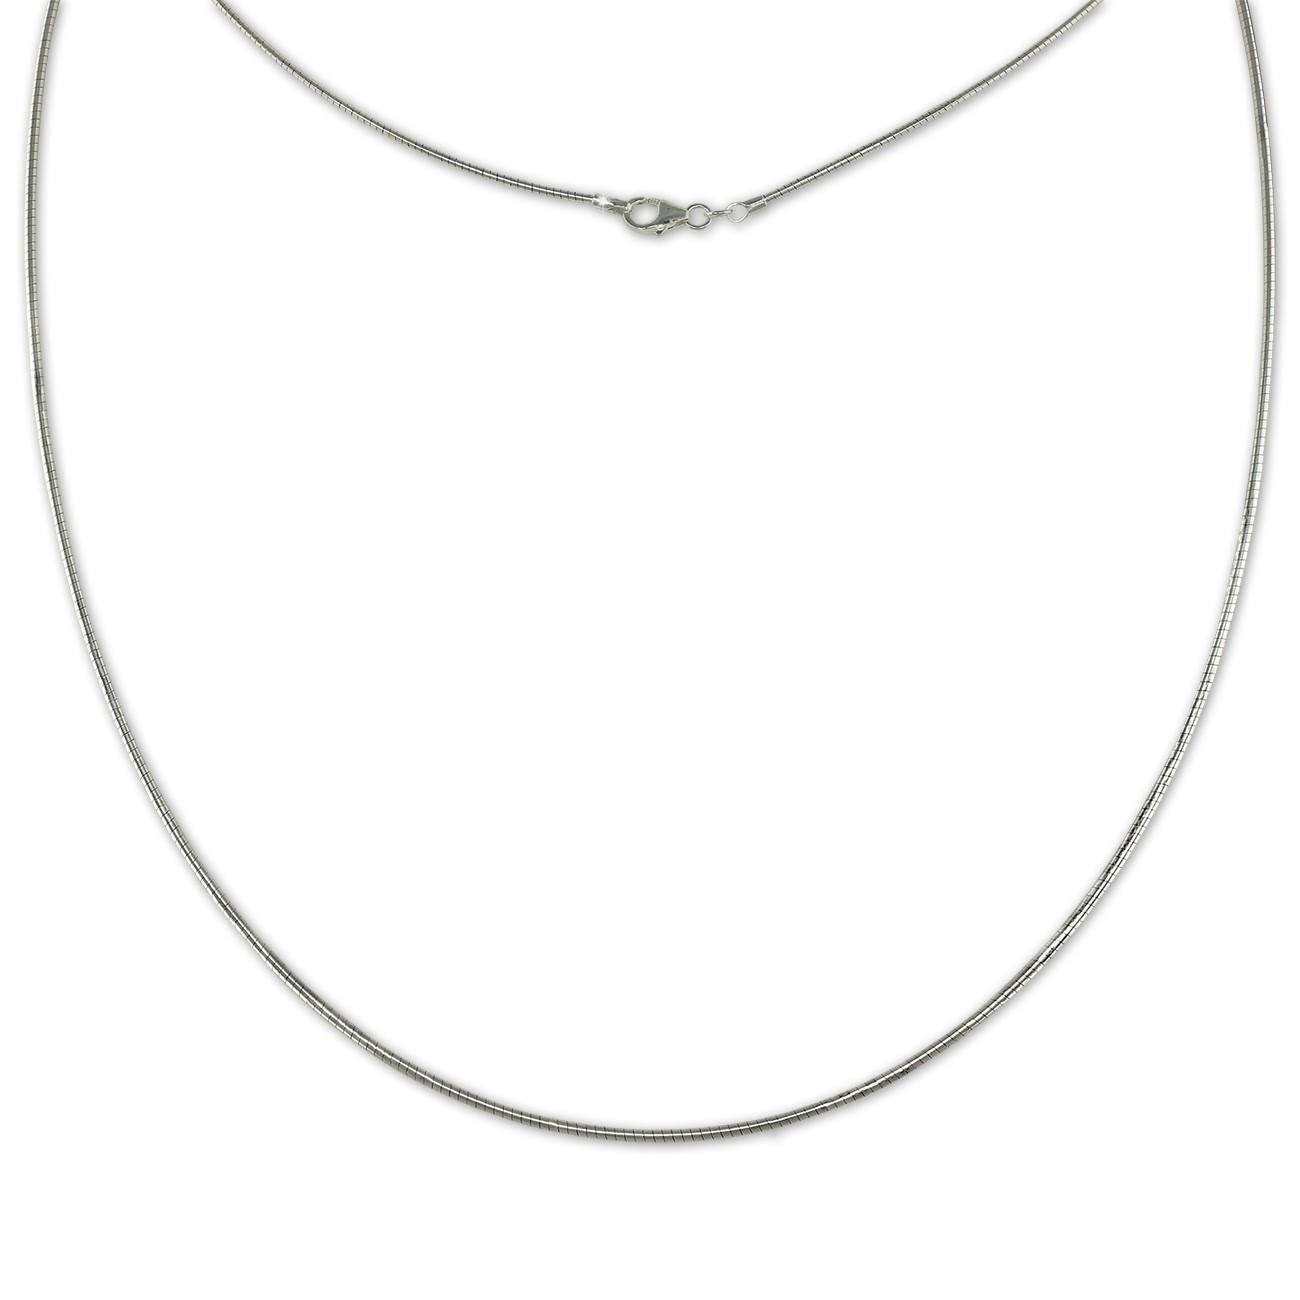 SilberDream Omega Halskette 925er Silber Damen Halsreif 45cm SDK22845J